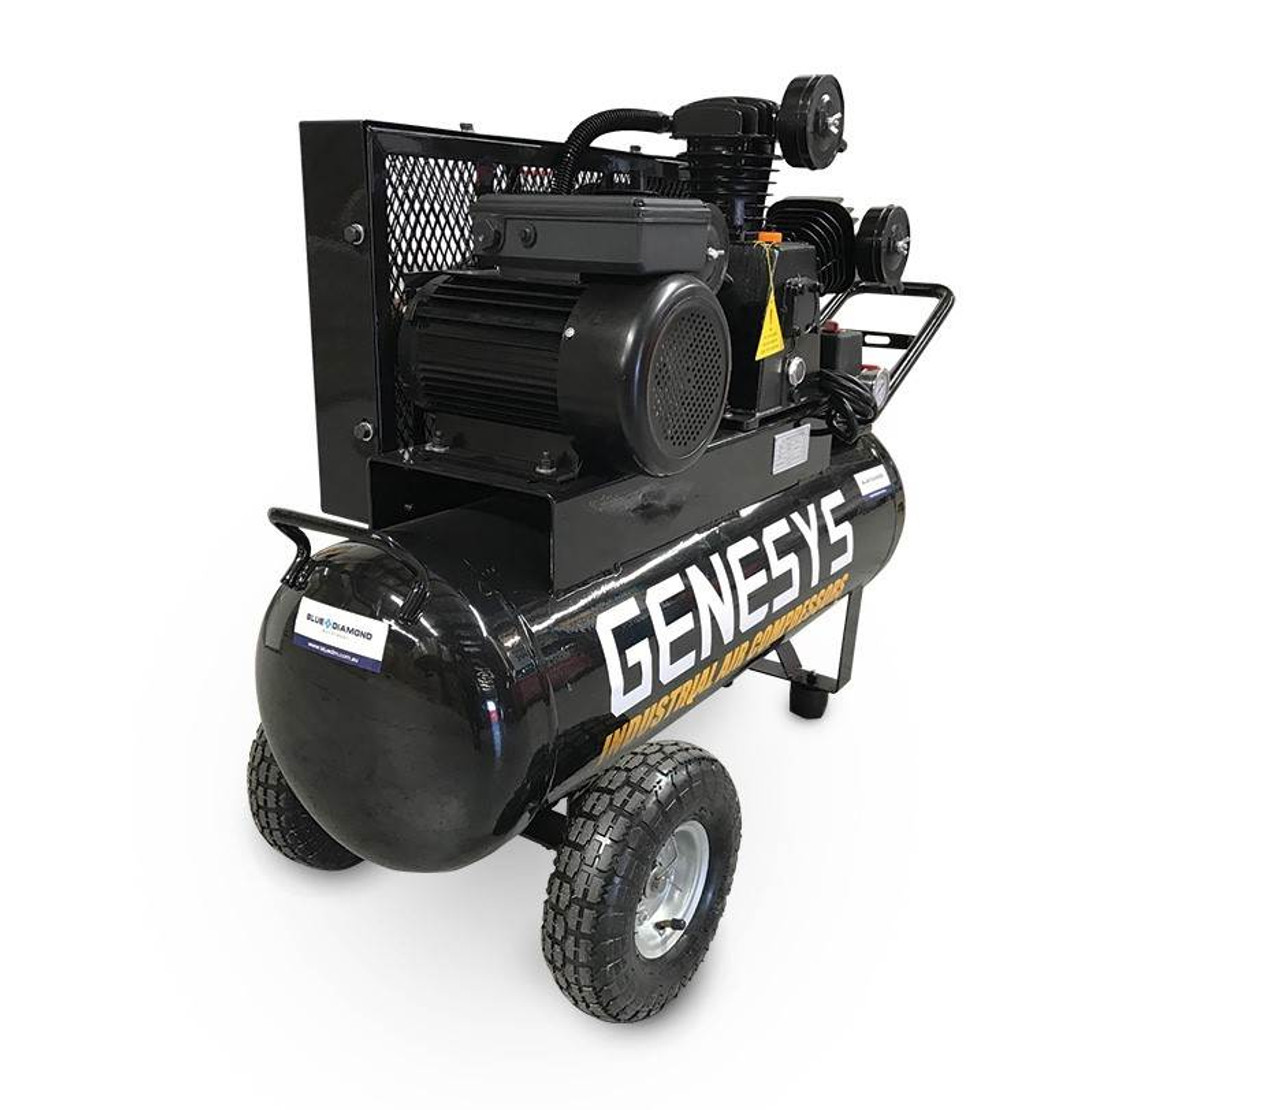 Piston Air Compressor 3.5HP, 18CFM, Genesys Brand,